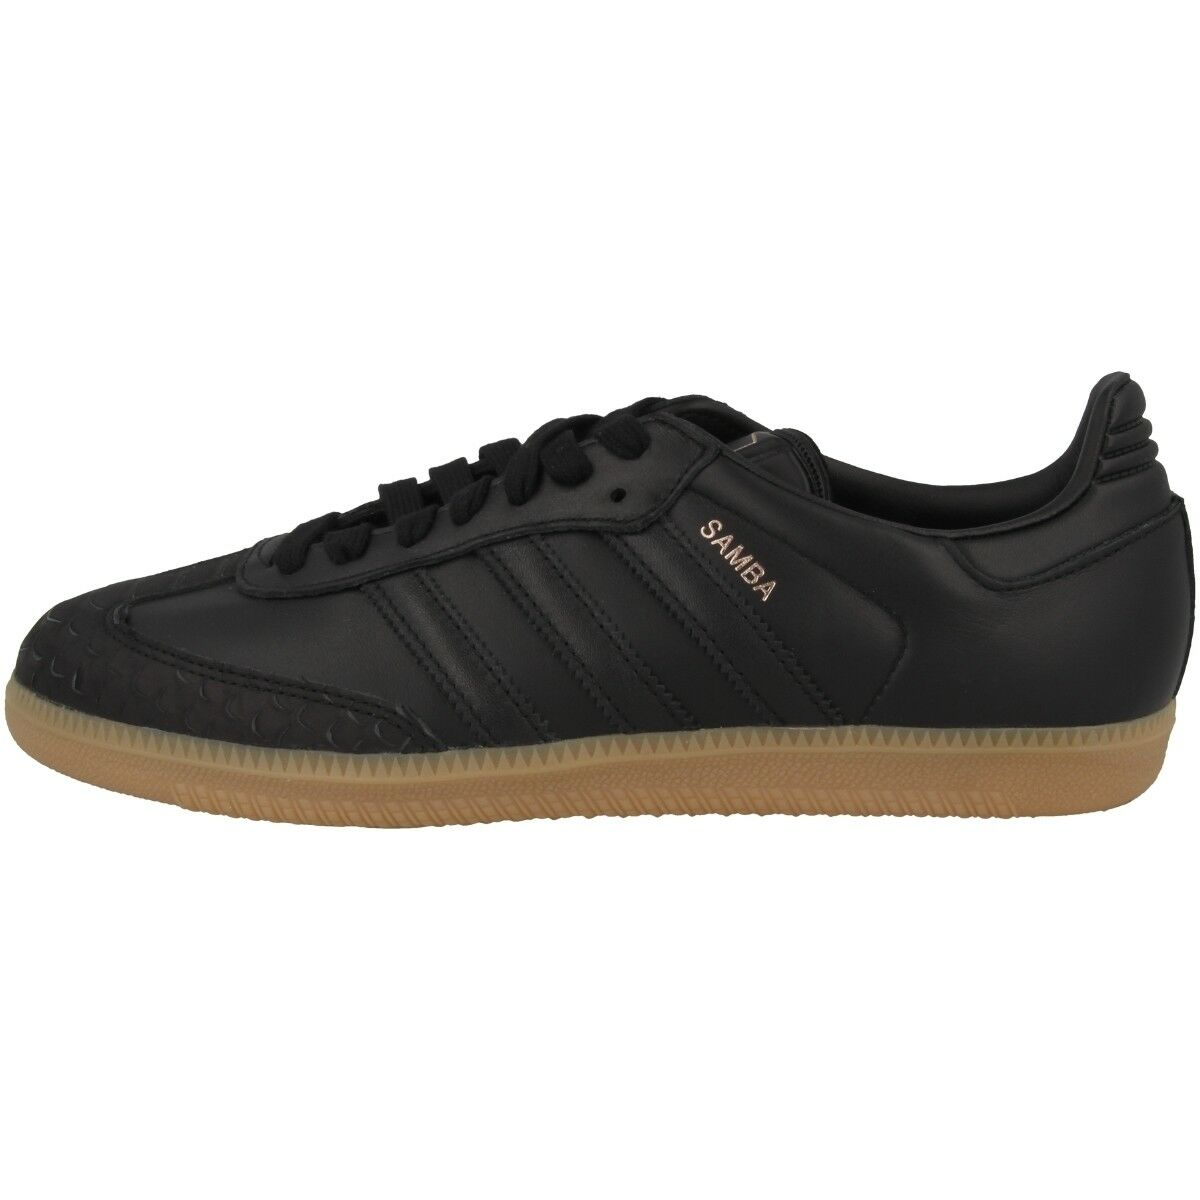 Zapatos promocionales para hombres y mujeres Adidas Samba Women Sneaker Damen Freizeit Leder Schuhe black CQ2641 Fußball